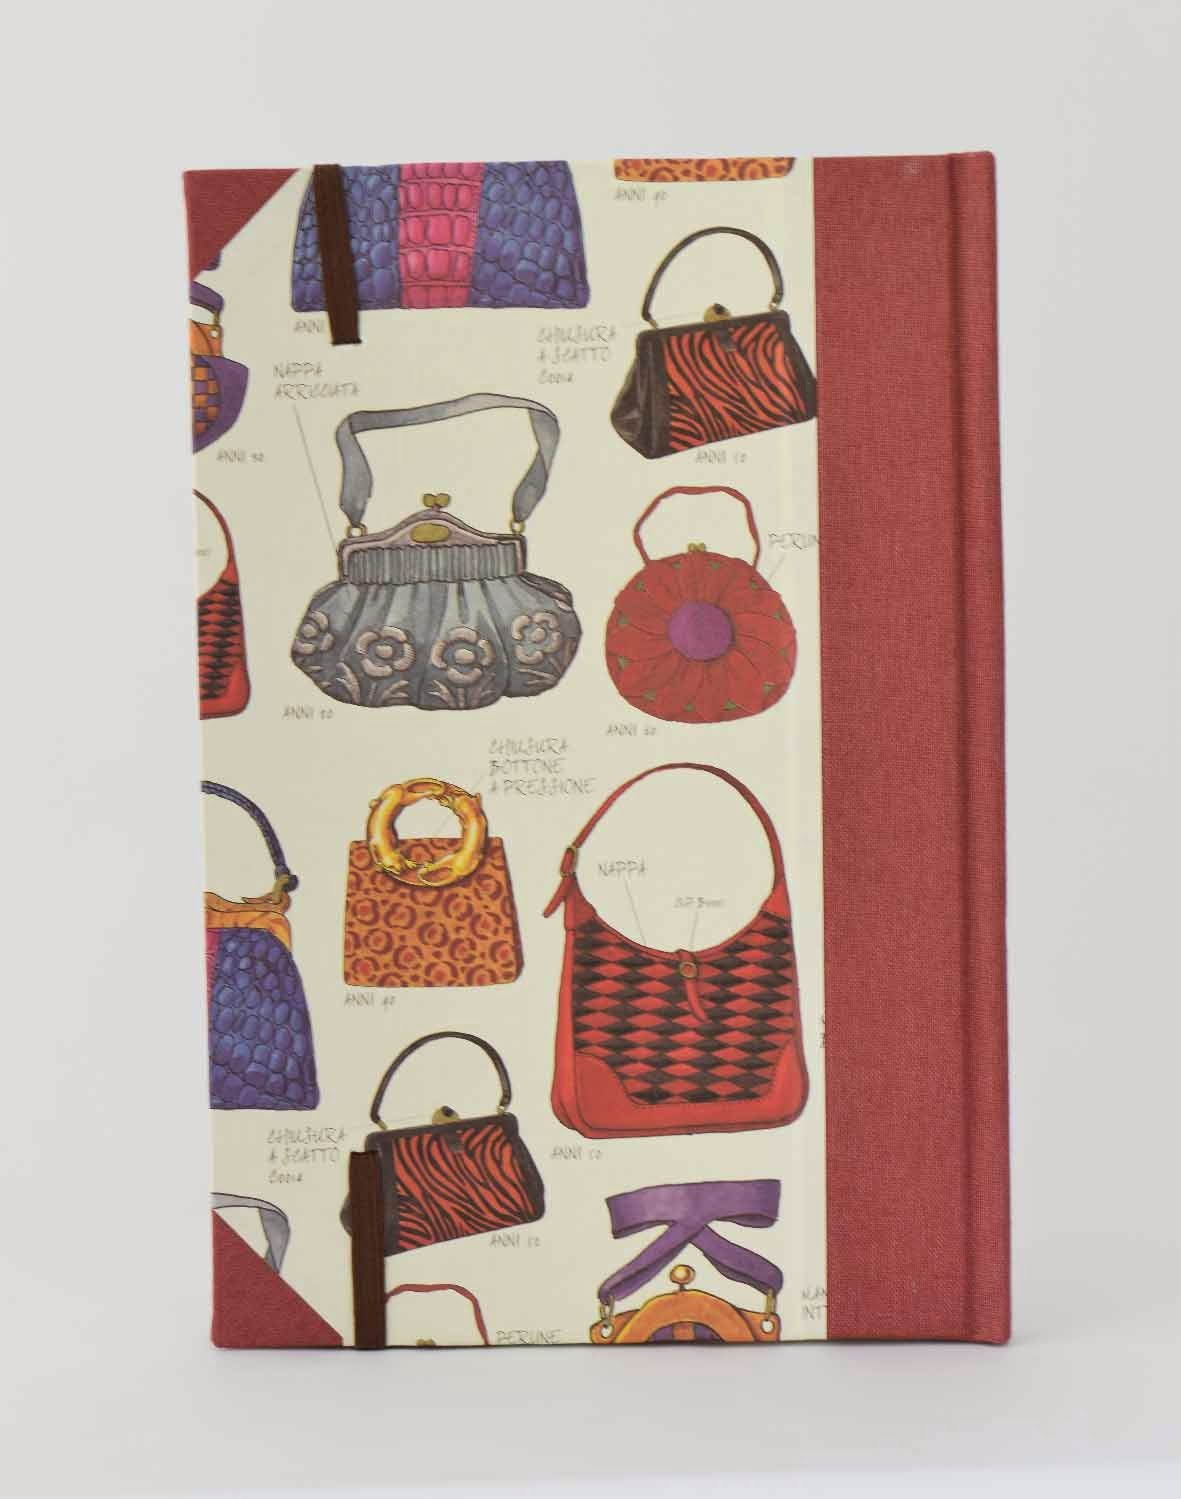 libro de firmas, suitbook, encuadernacion, bookbinding, artesanal, handmade